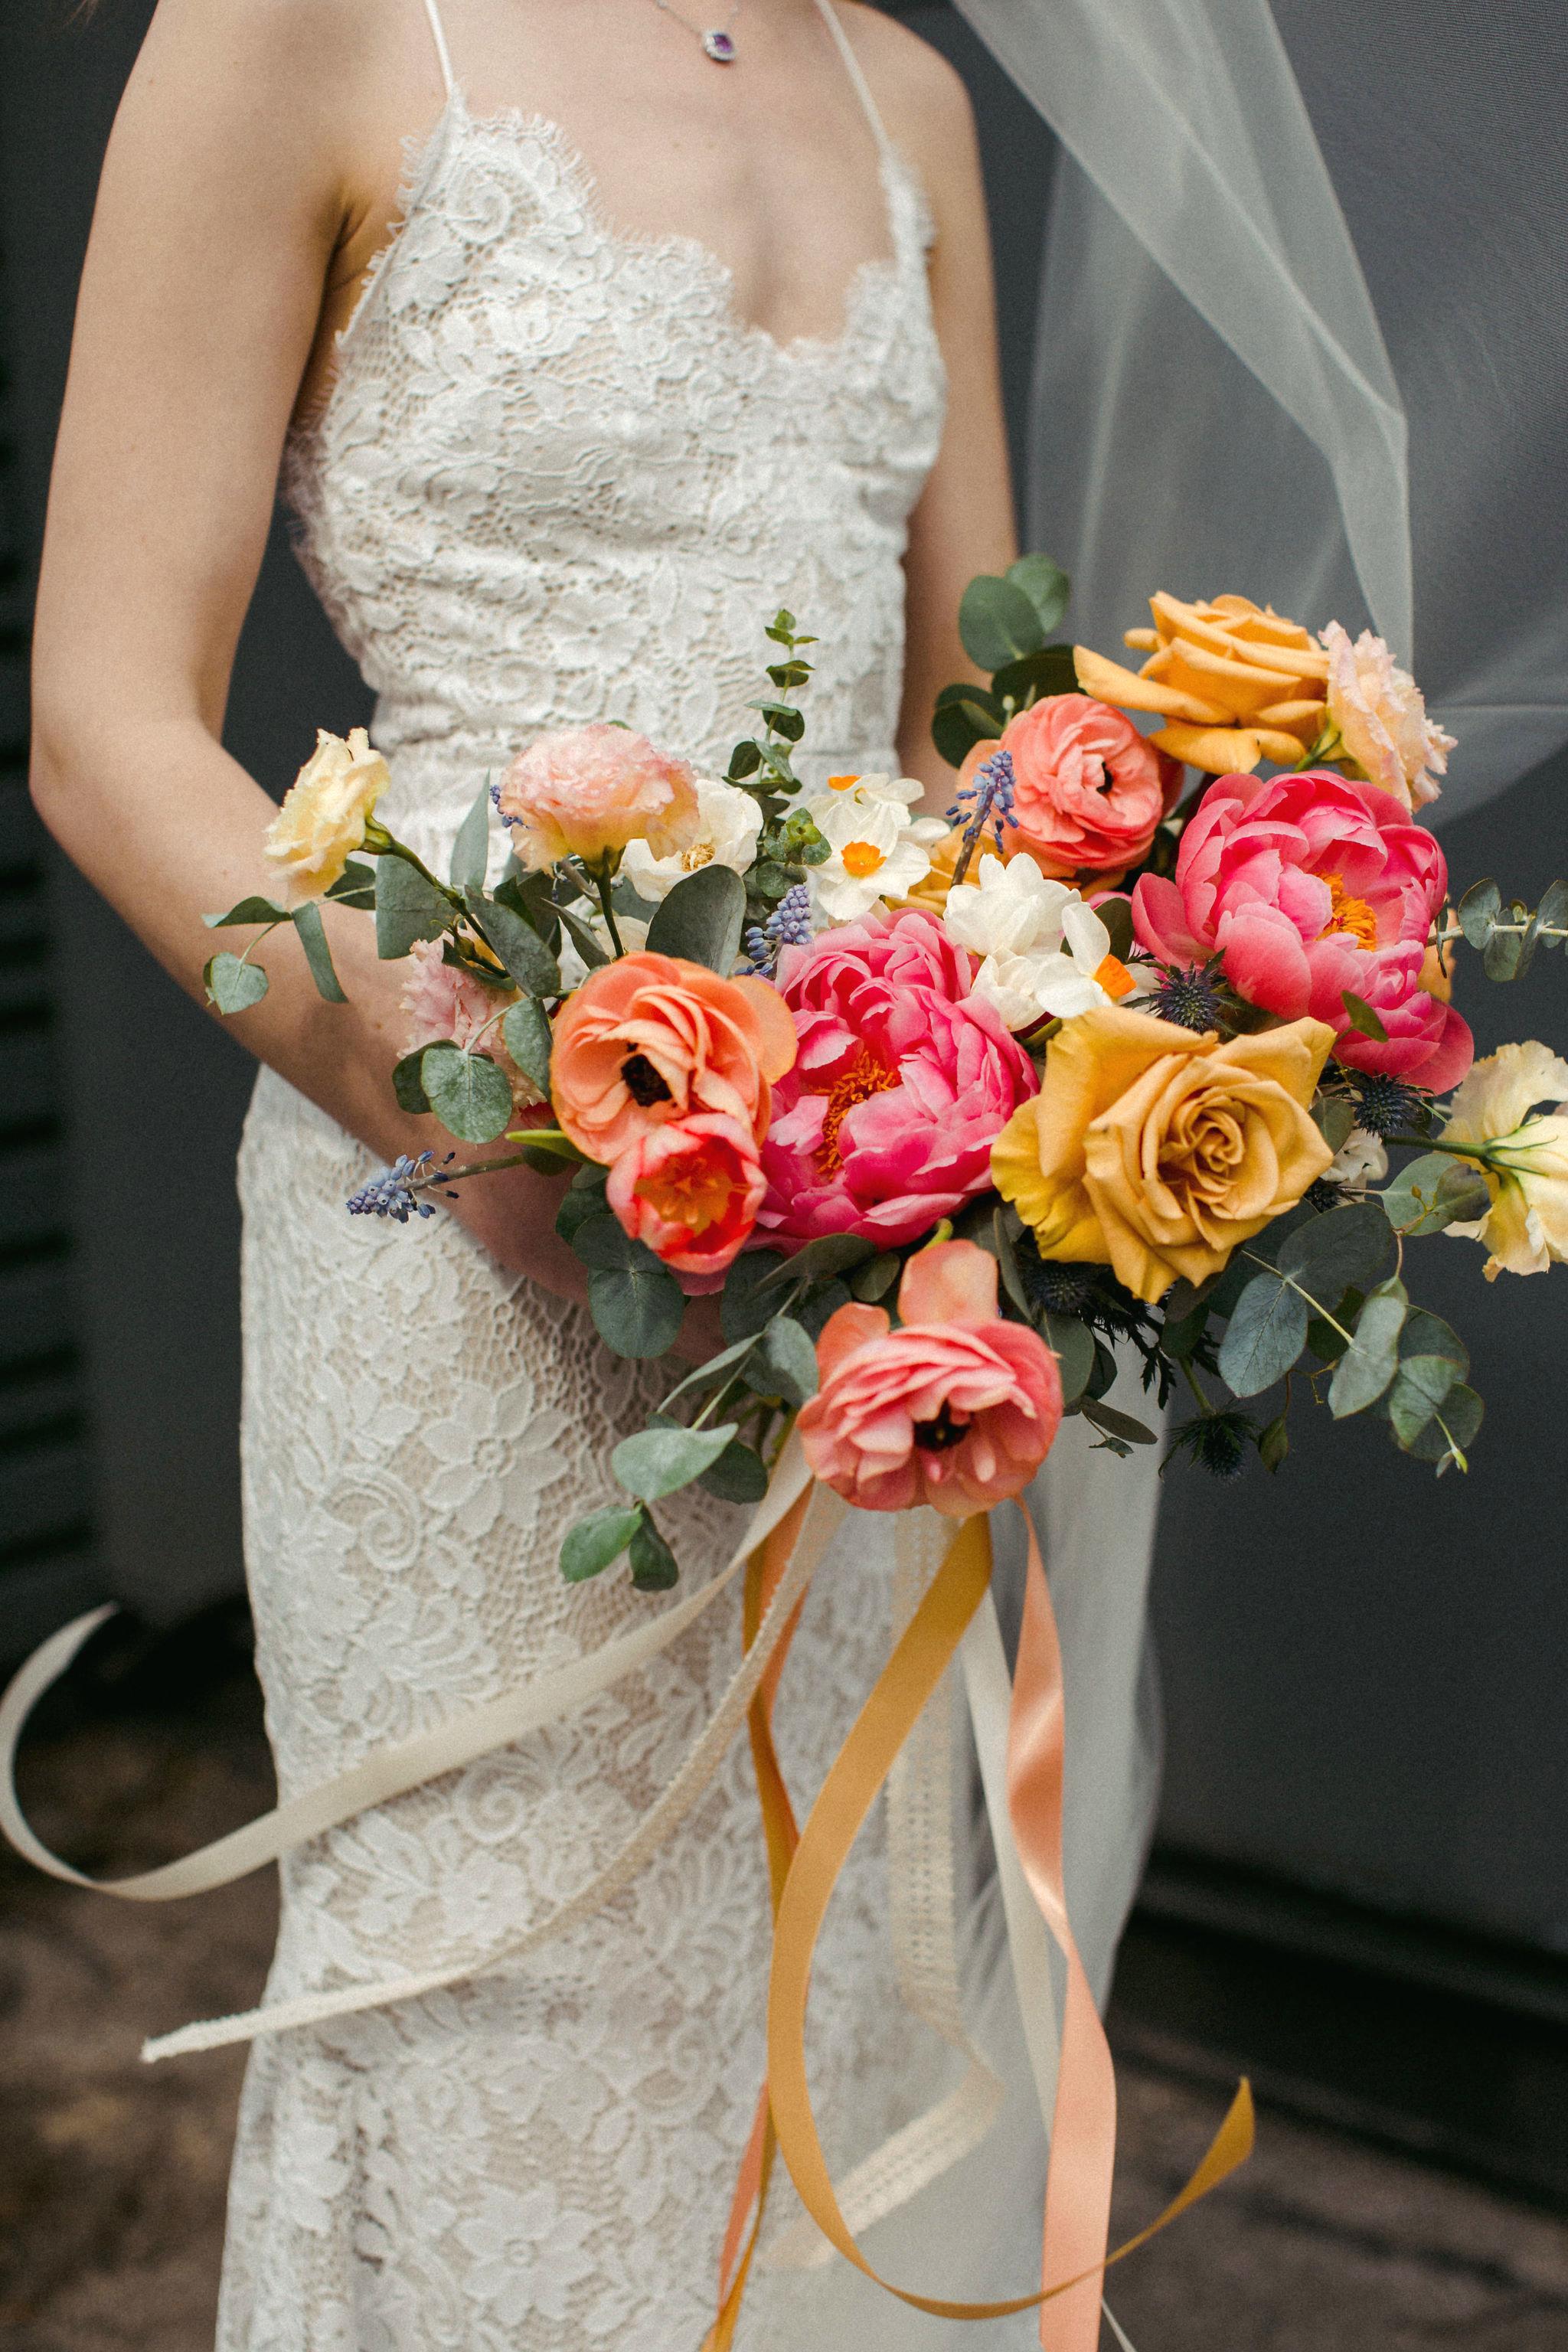 18-0505CH-DanijelaWeddings-wedding-176 copy.jpg